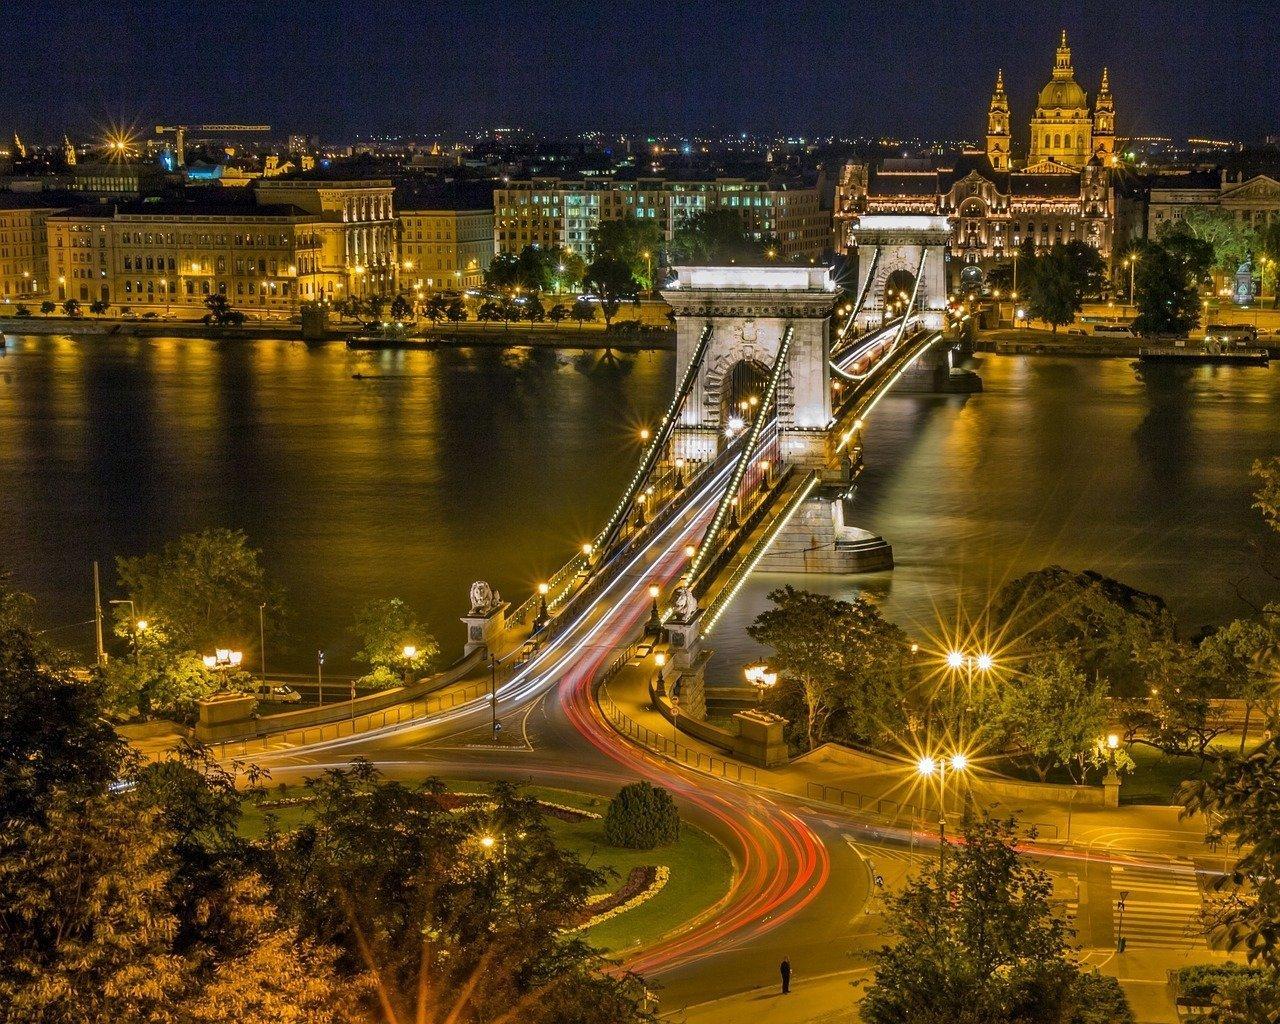 Budapest Chain Bridge among the most beautiful bridges in the world